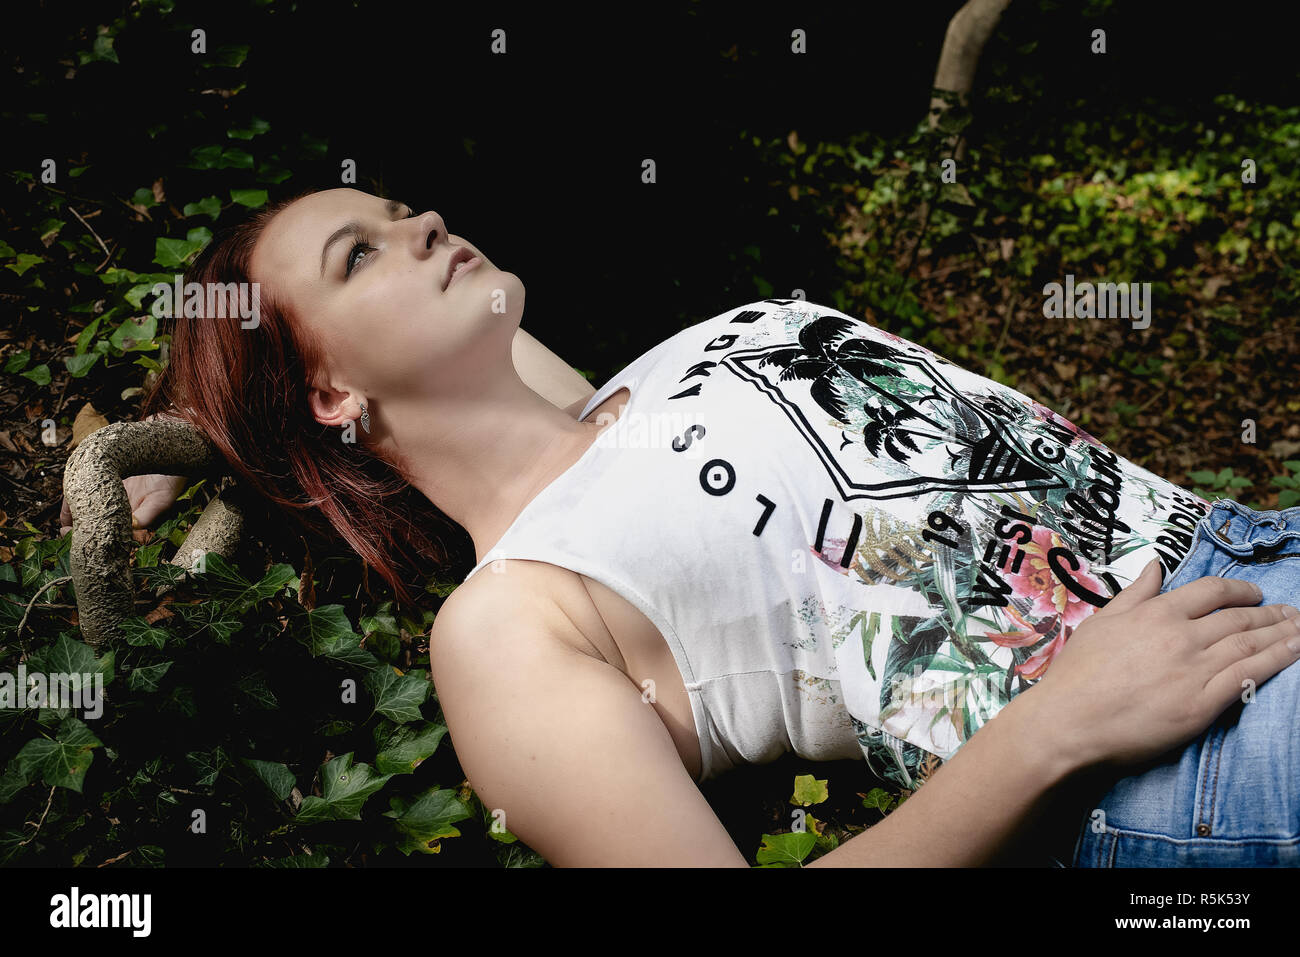 A young woman enjoys nature Stock Photo